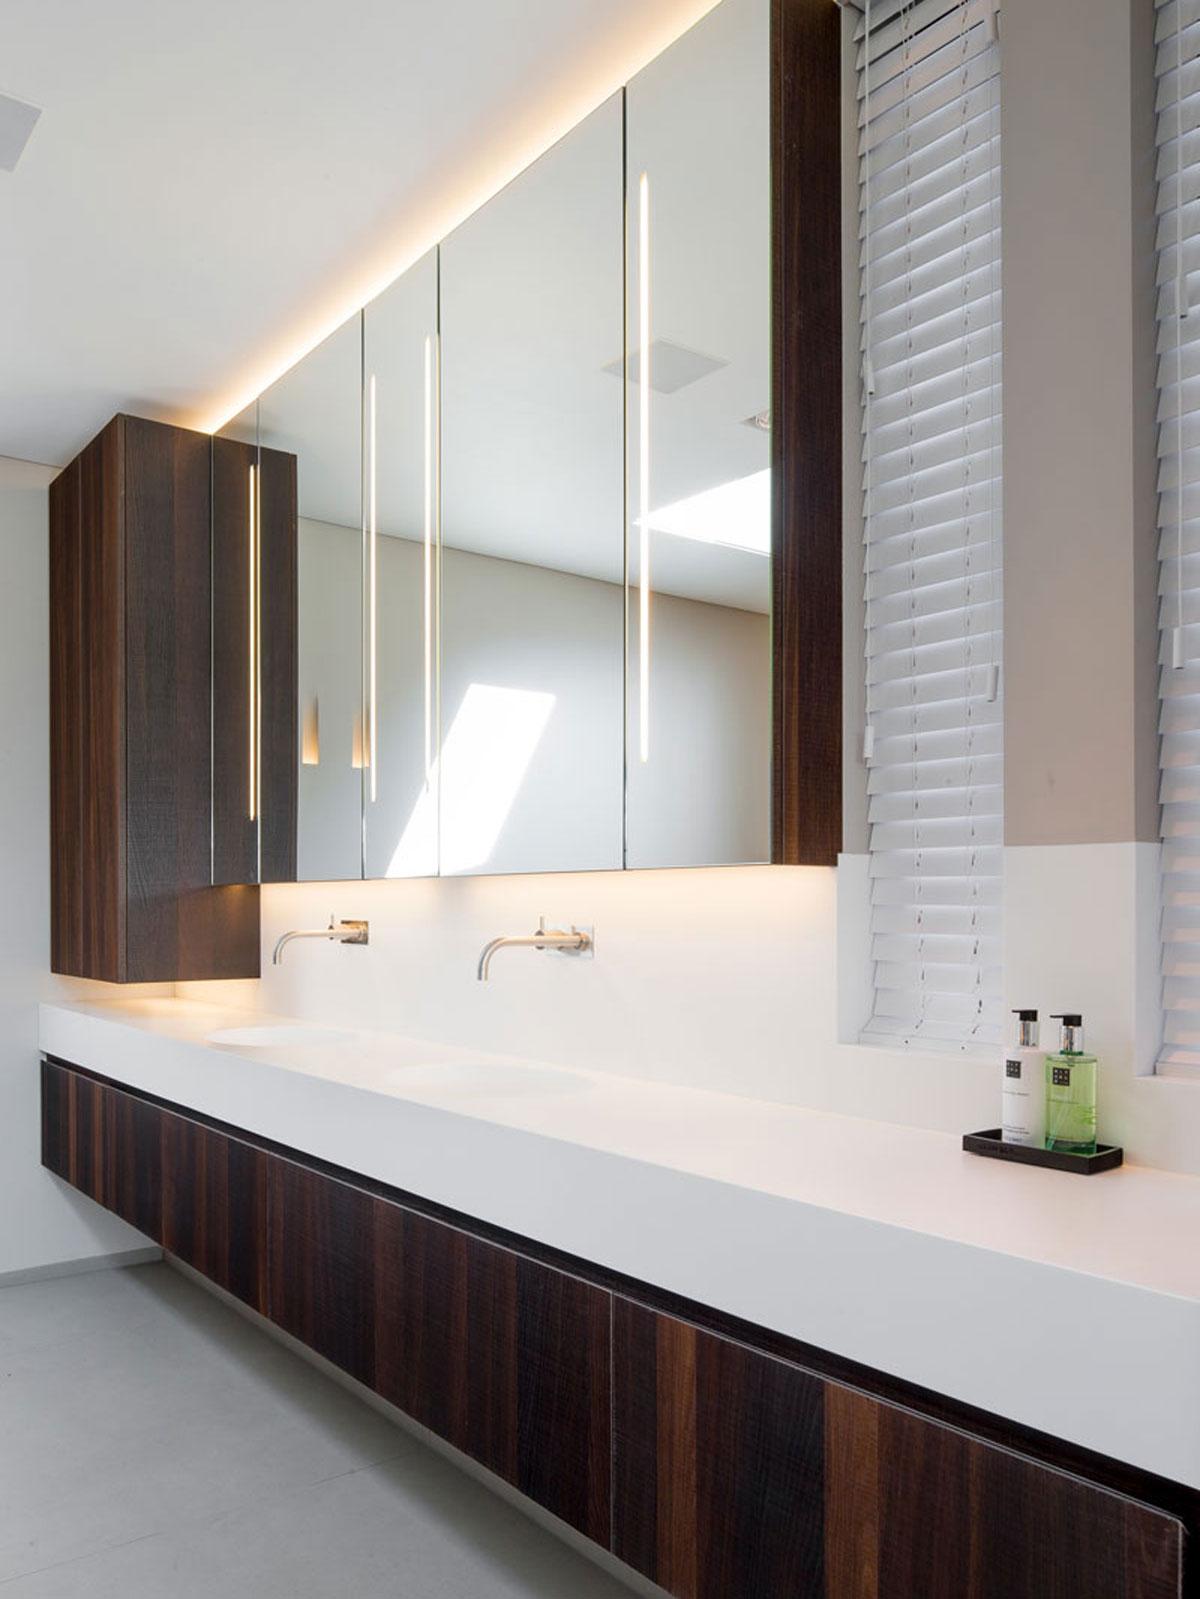 badkamer kraan, vola, uniek design, exclusief, luxueus, françois hannes